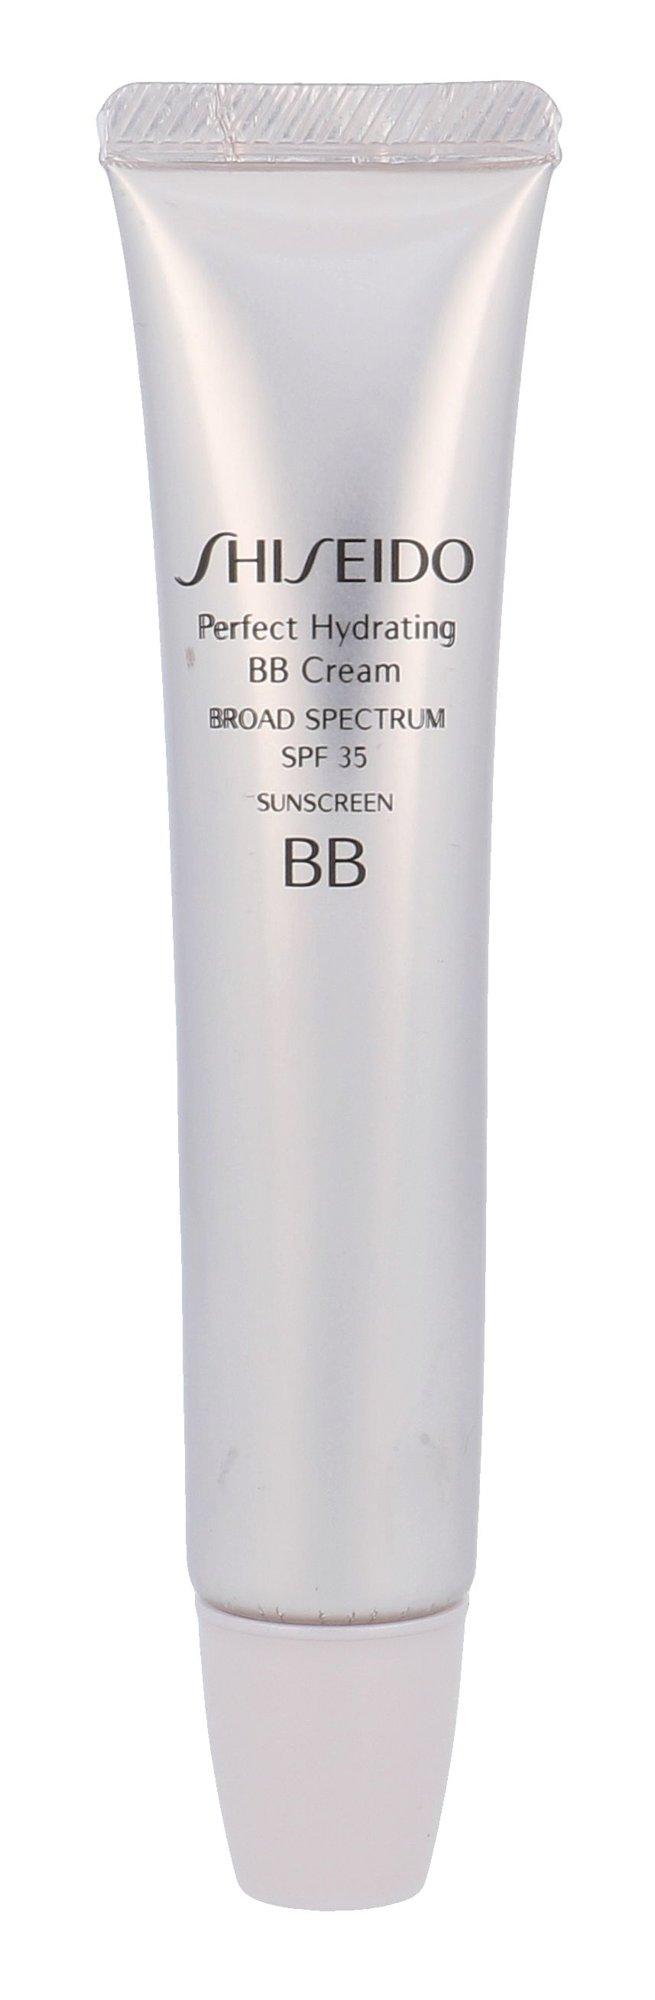 Shiseido Perfect Hydrating Cosmetic 30ml Dark